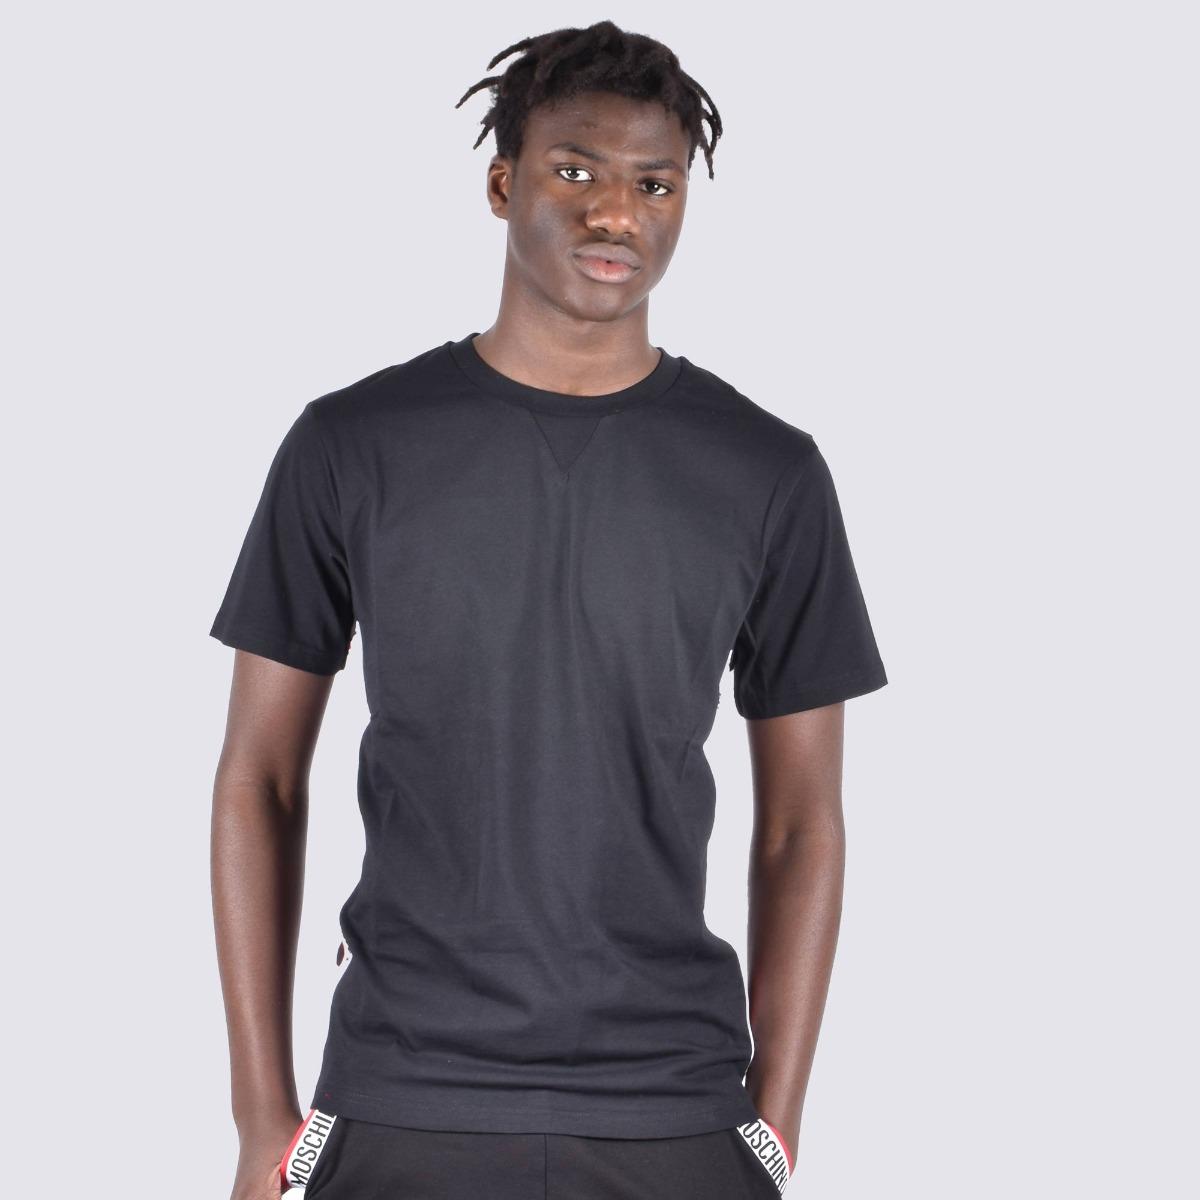 T-shirt fascia logo laterale - Nero